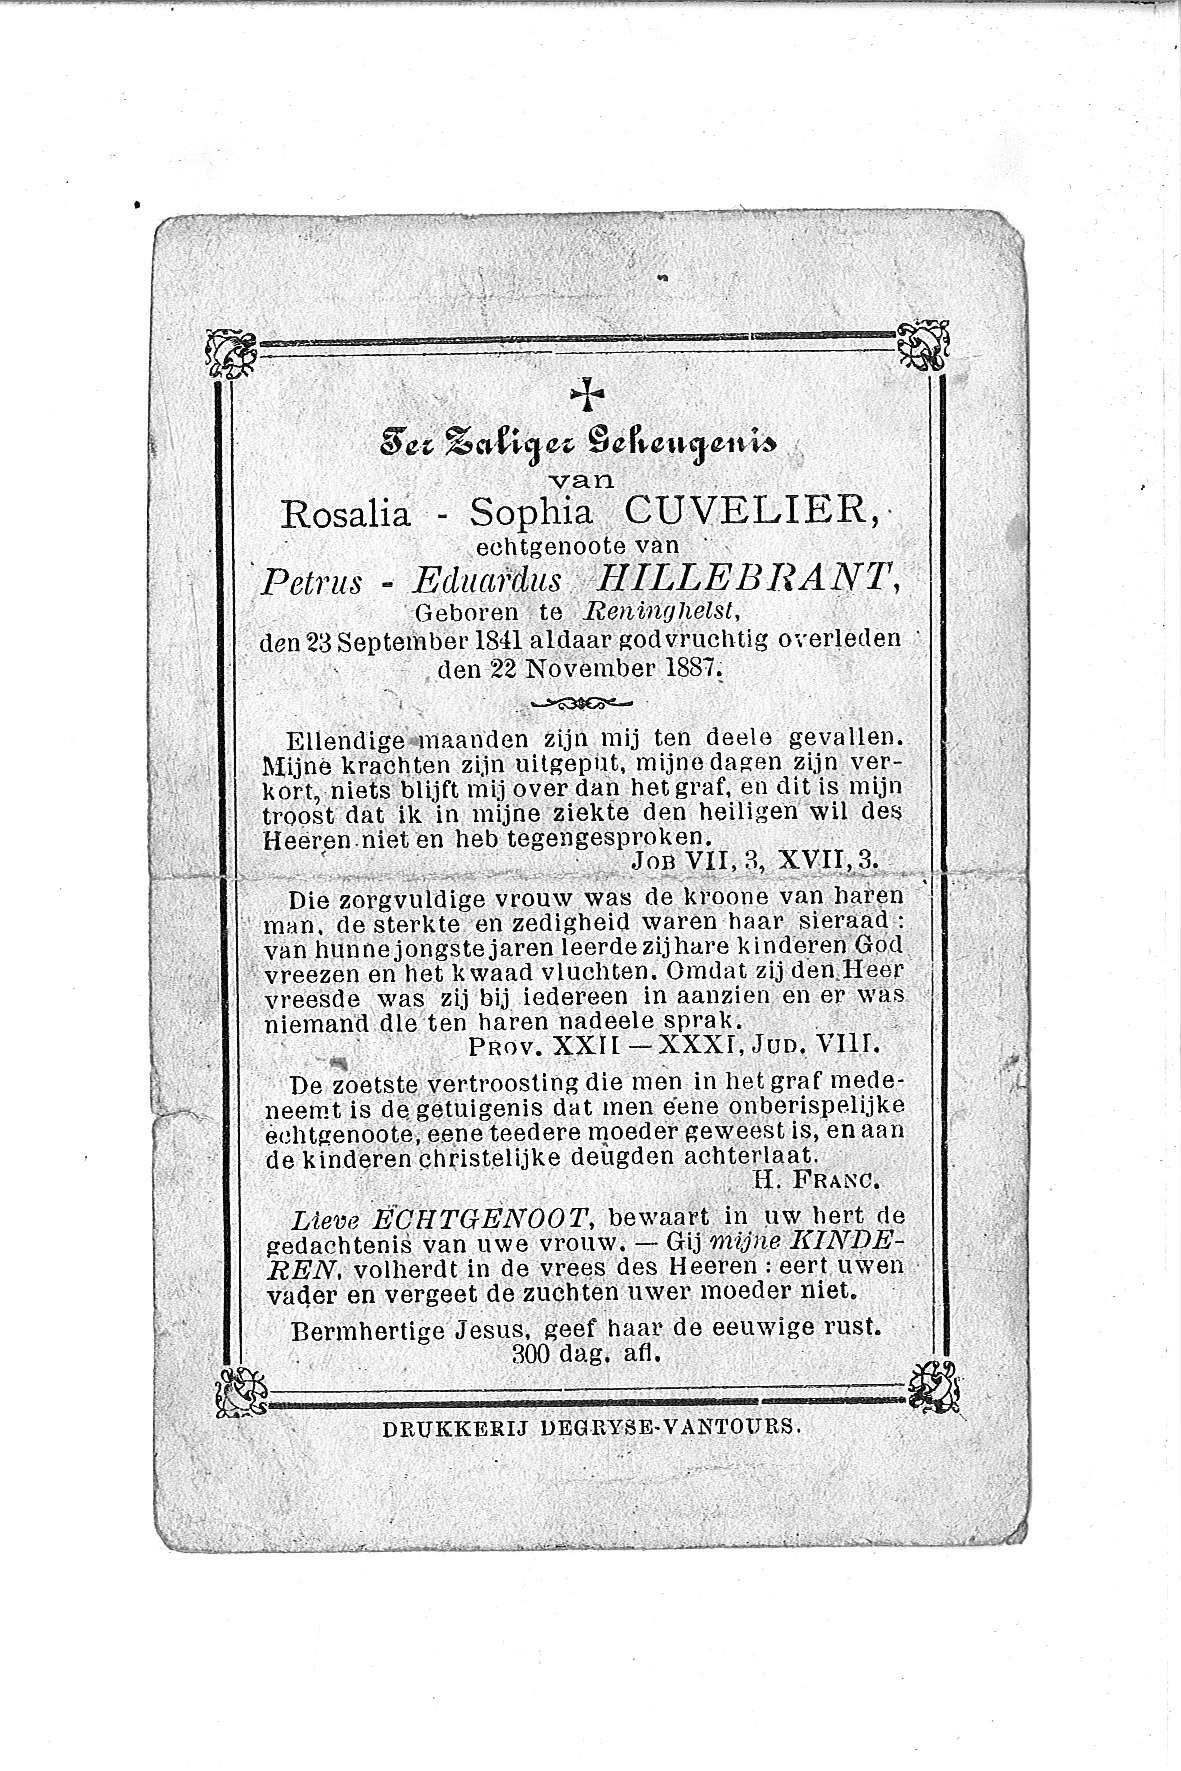 rosalia-sophia(1887)20120329074916_00042.jpg